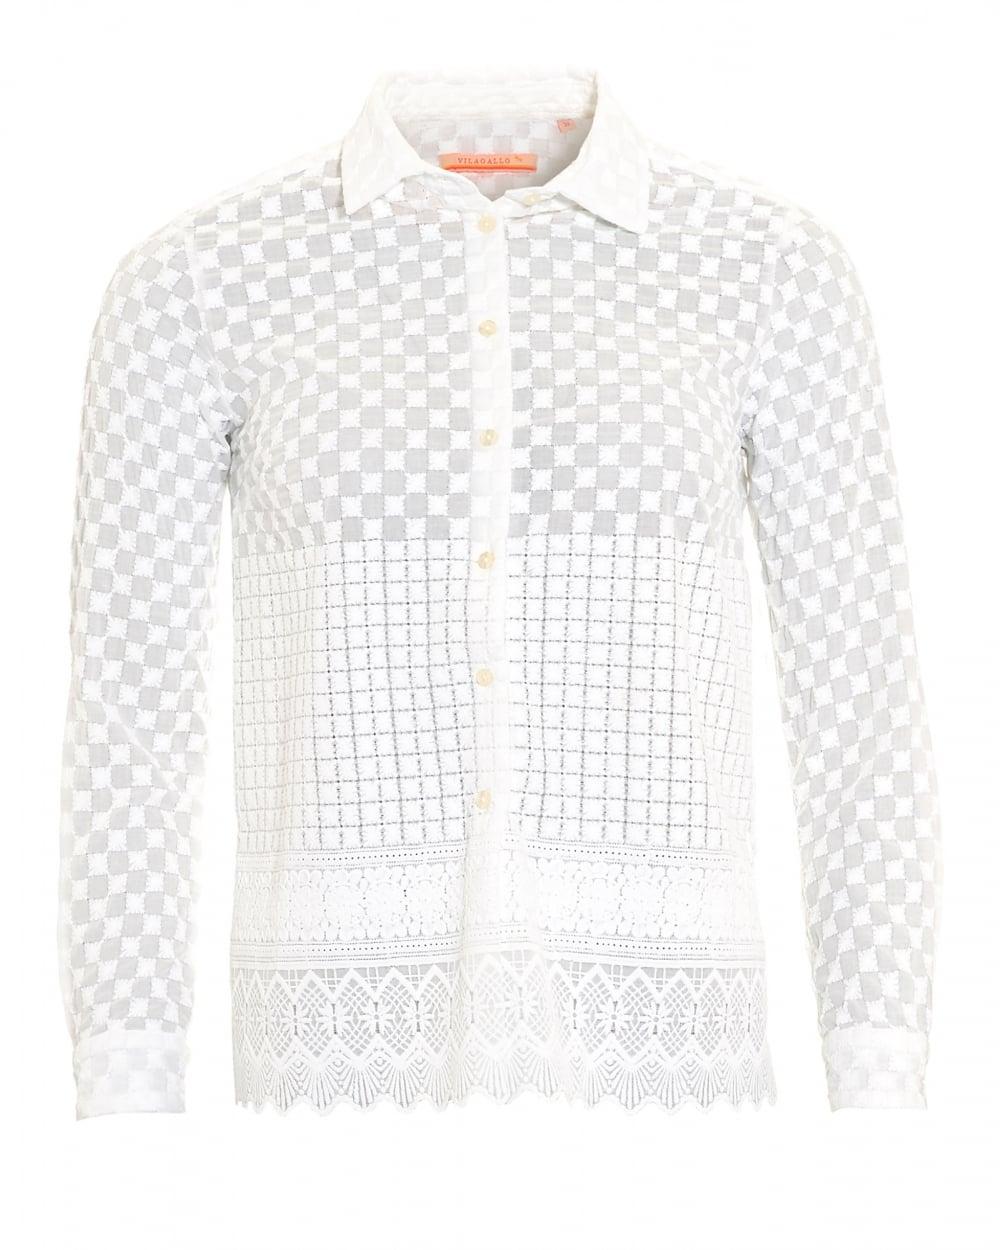 2015 Newly Spring Summer Three Quarter Sleeve Cotton Blouse Long White  Embroidery Shirt Women Joker Blouse Shirt